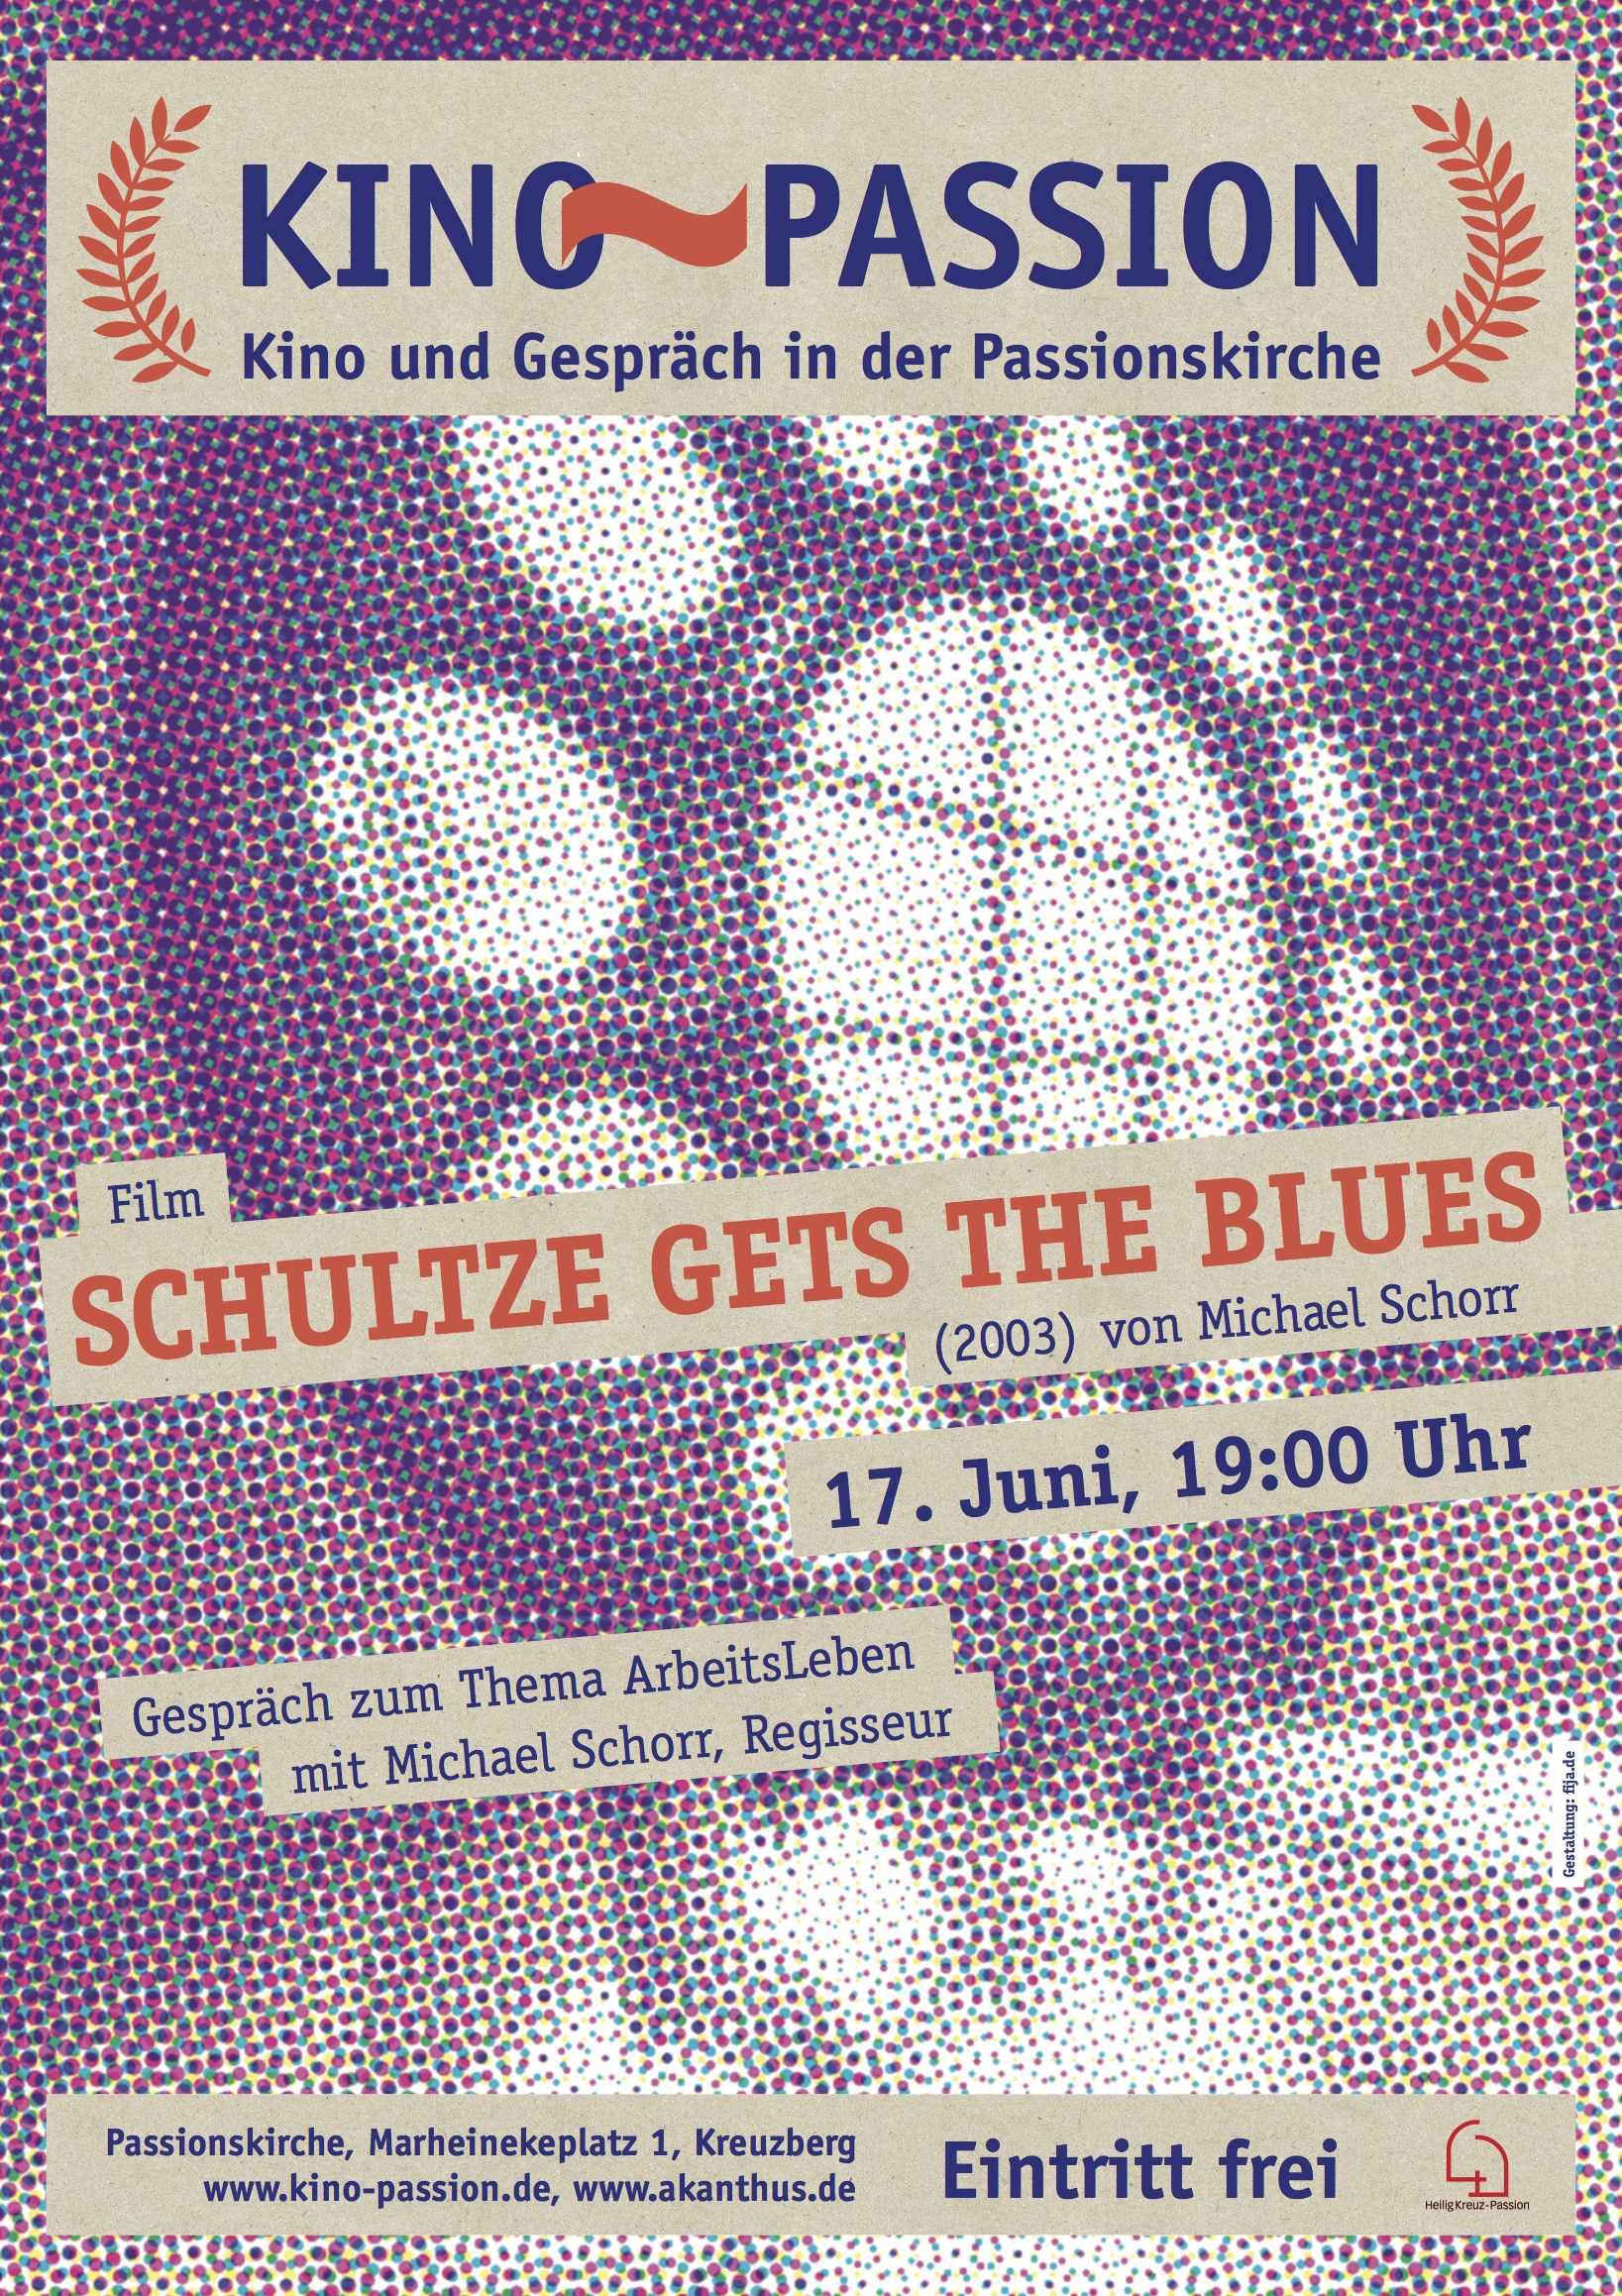 97_Kino-passion_Schulze.jpg